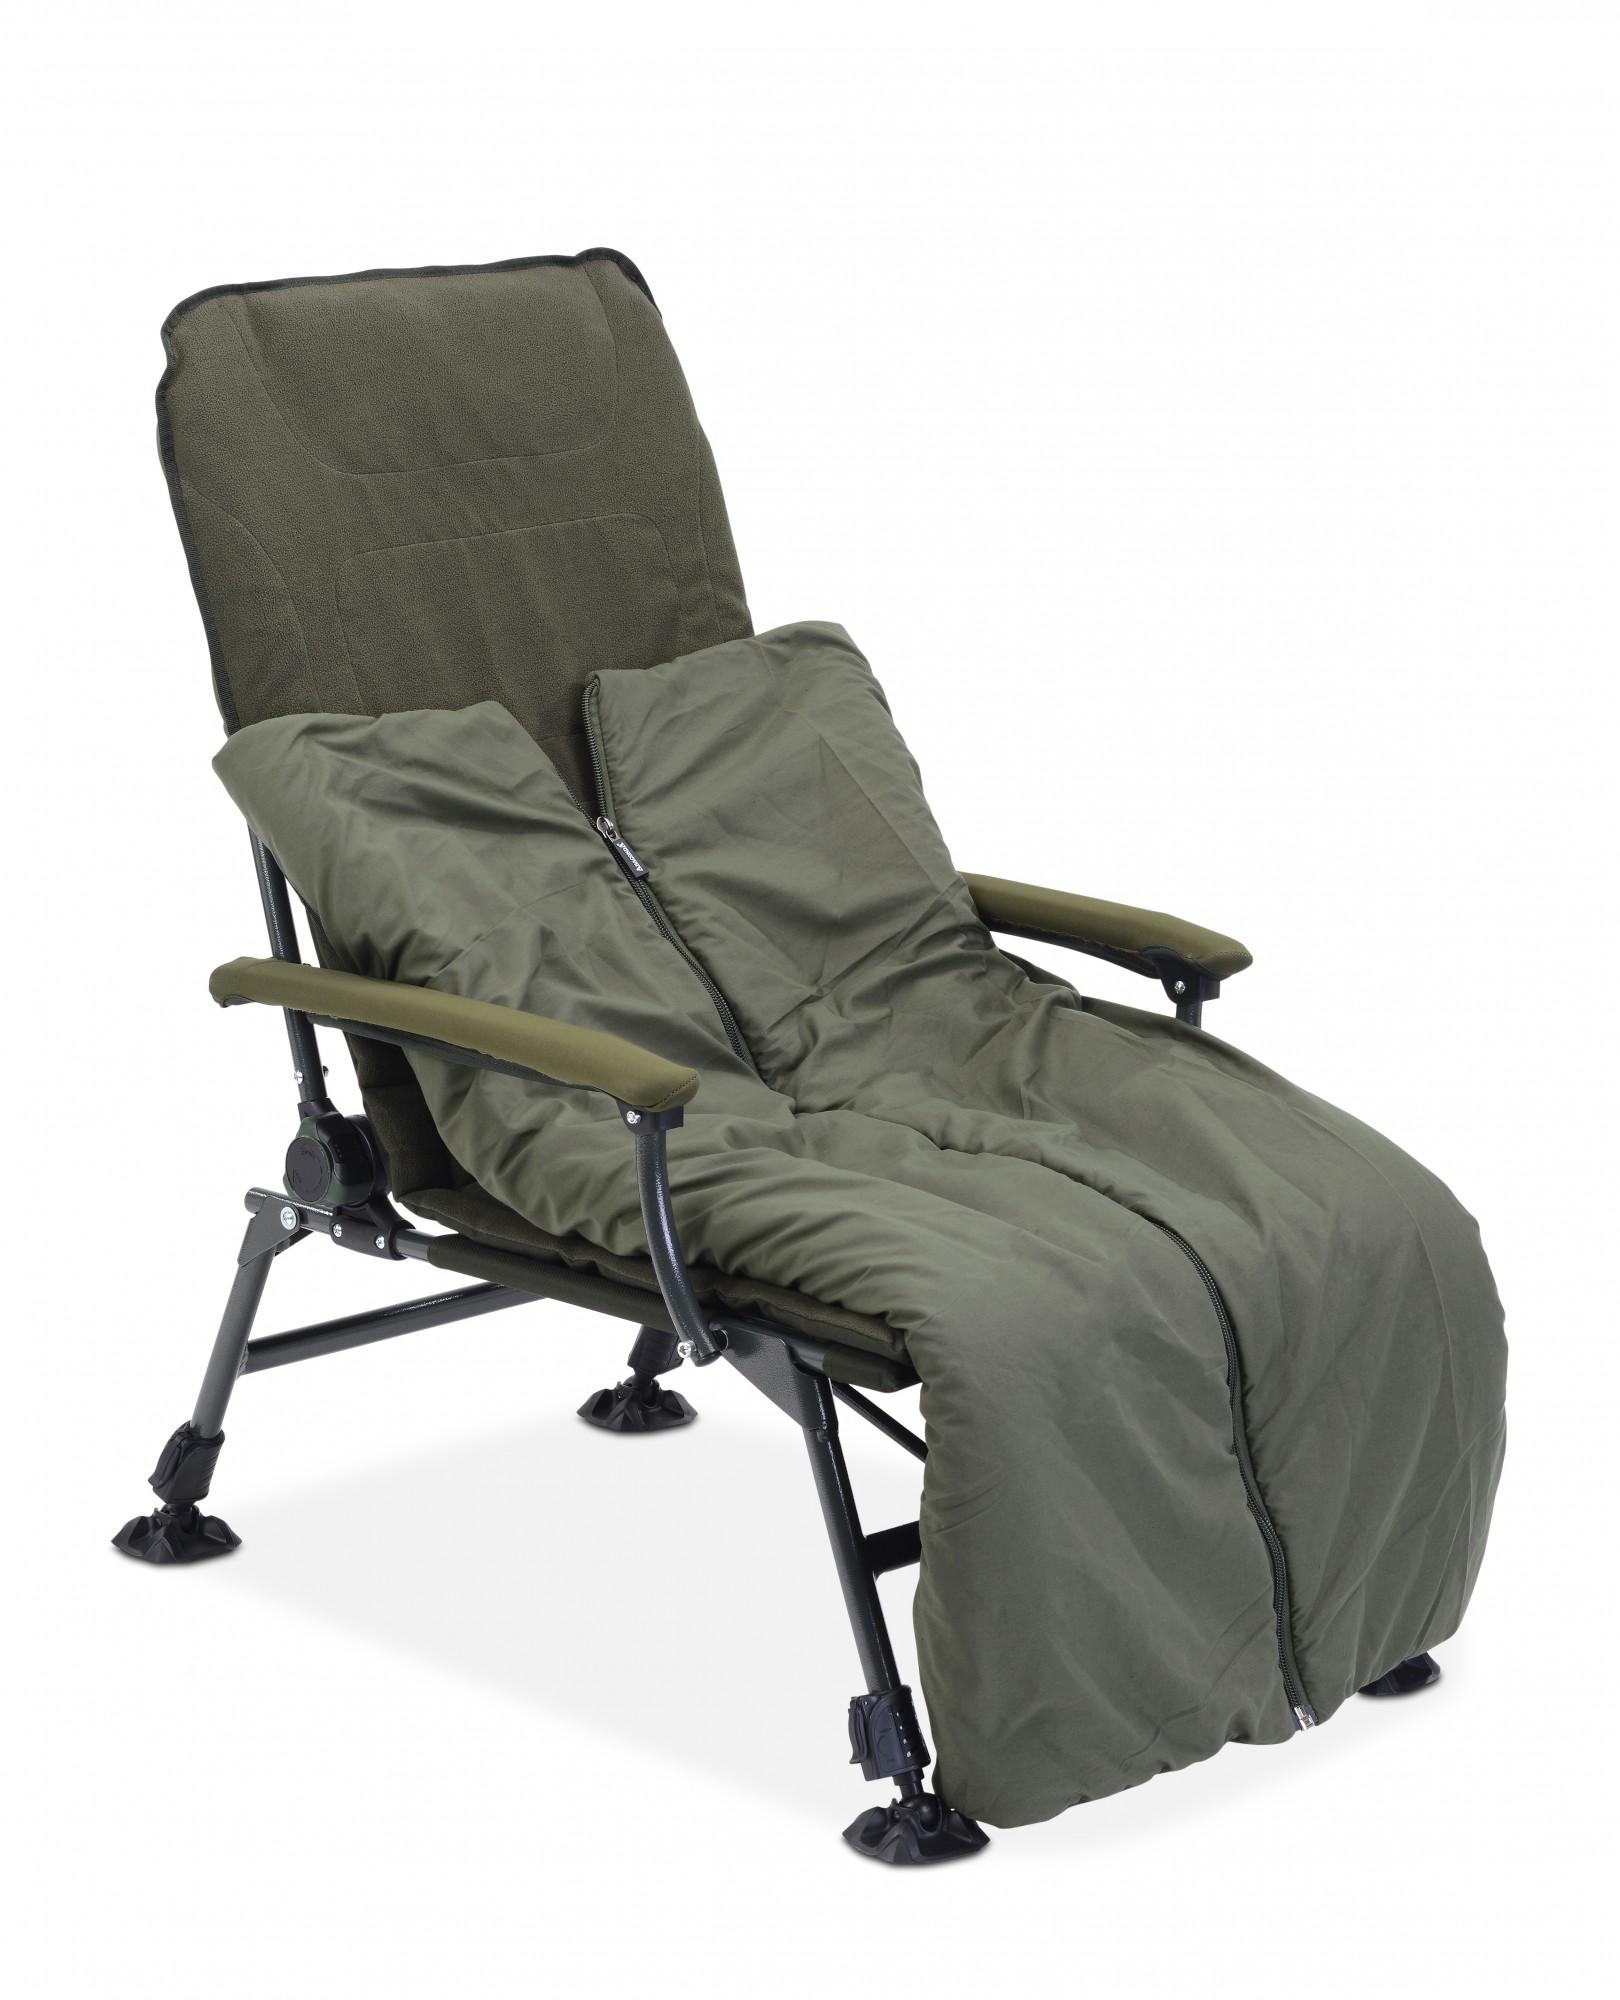 anaconda-nighthawk-chair-angelstuhl-karpfenstuhl-165kg-belastbar-stuhl